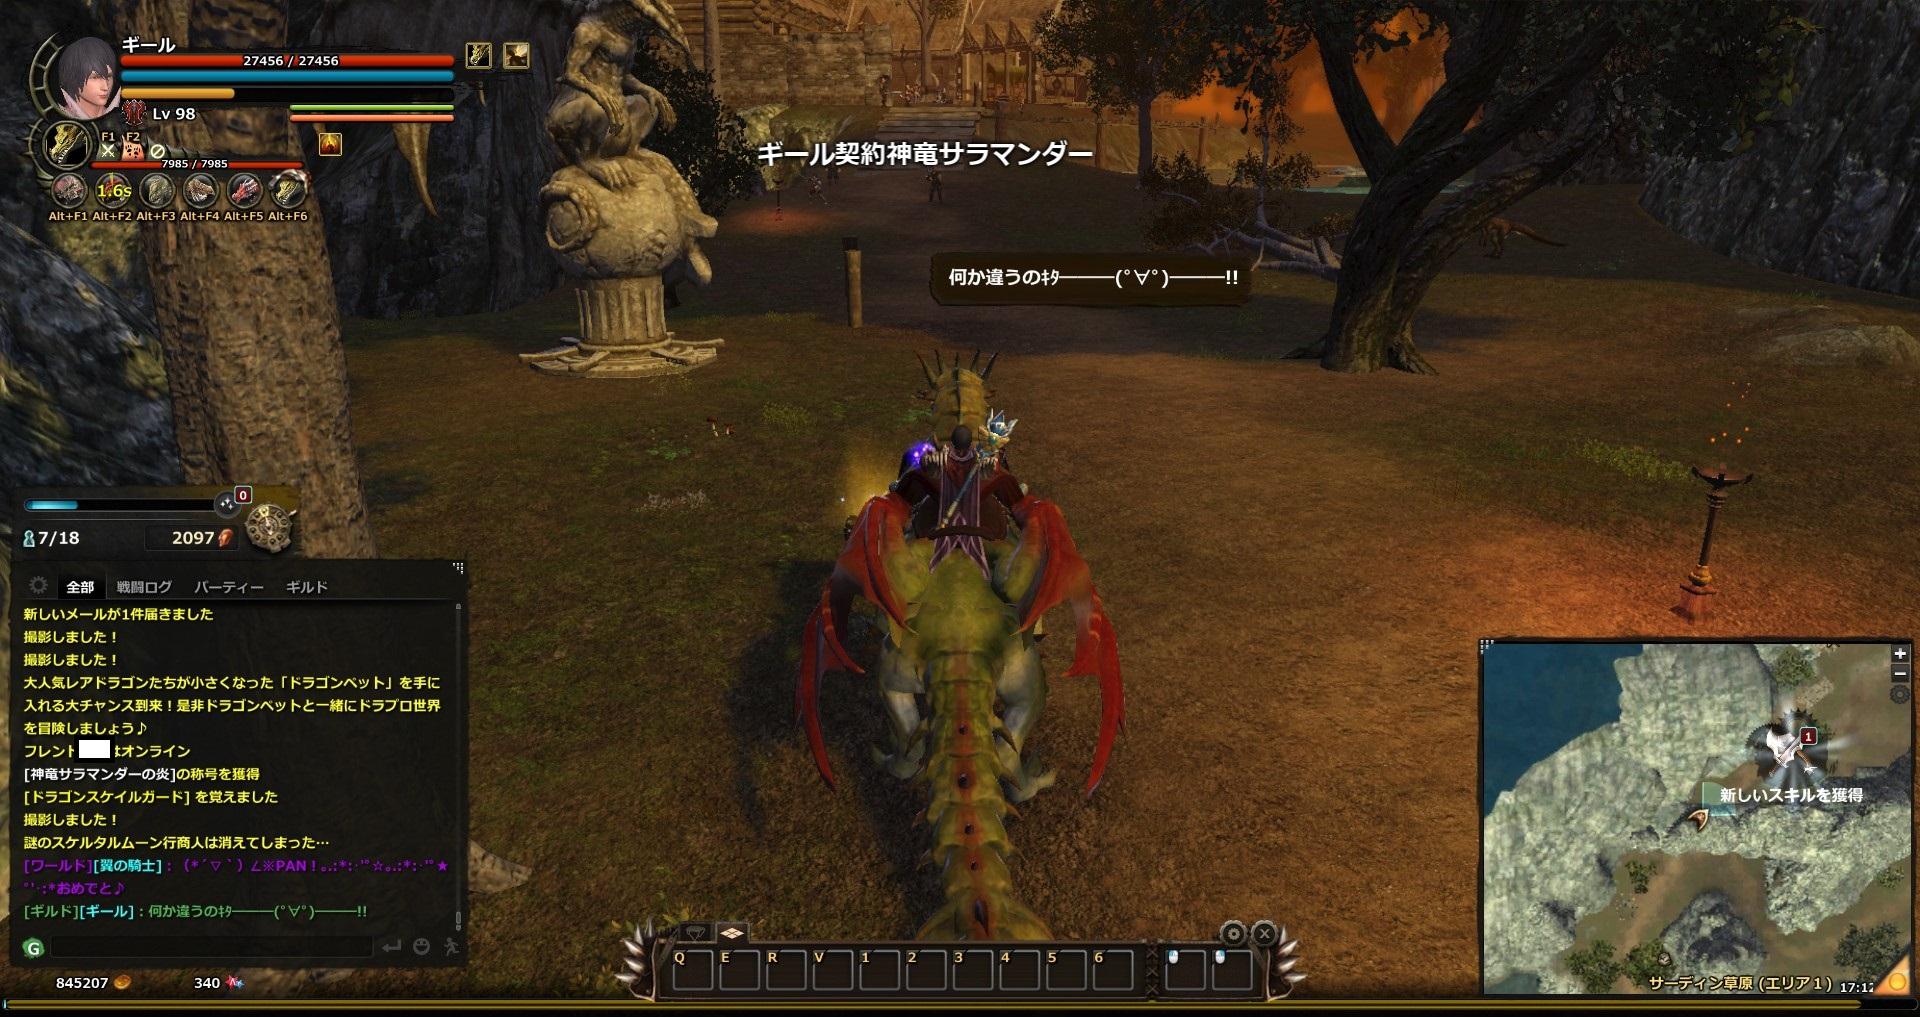 DragonsProphet_20140712_171241.jpg